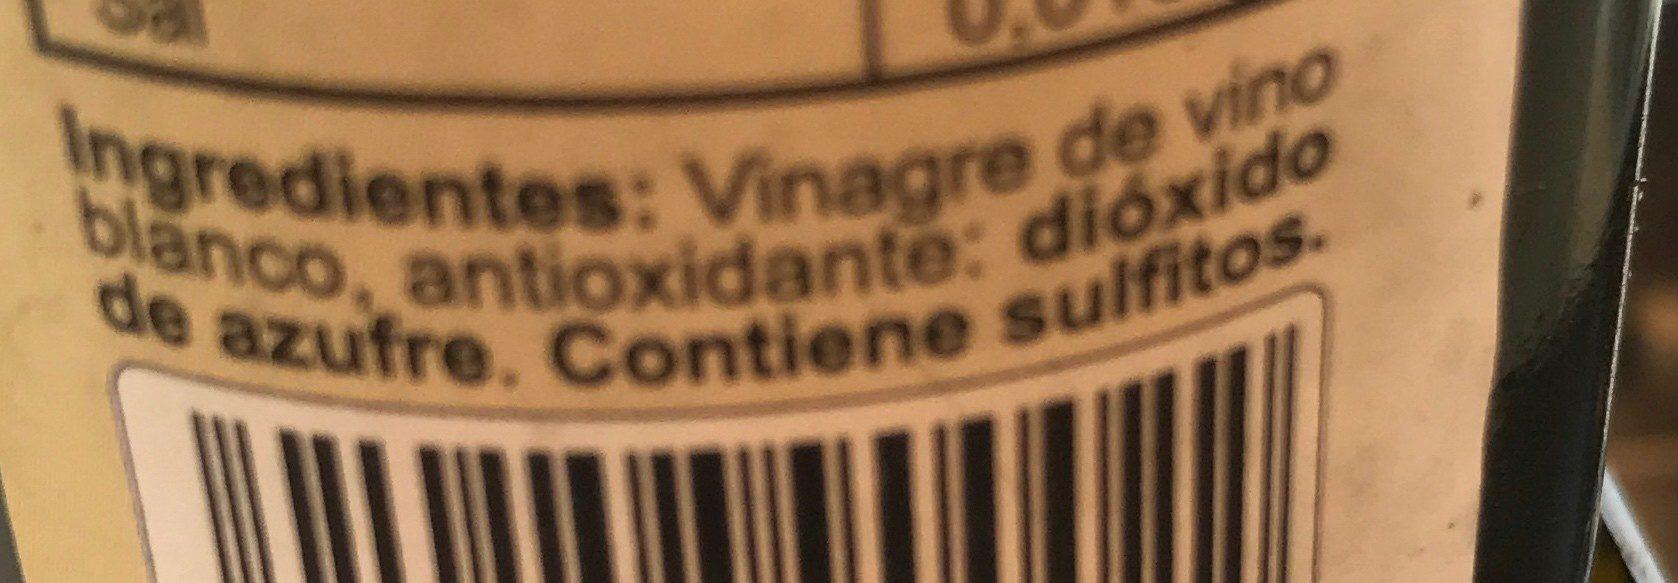 Vinagre de vino blanco - Ingredientes - fr